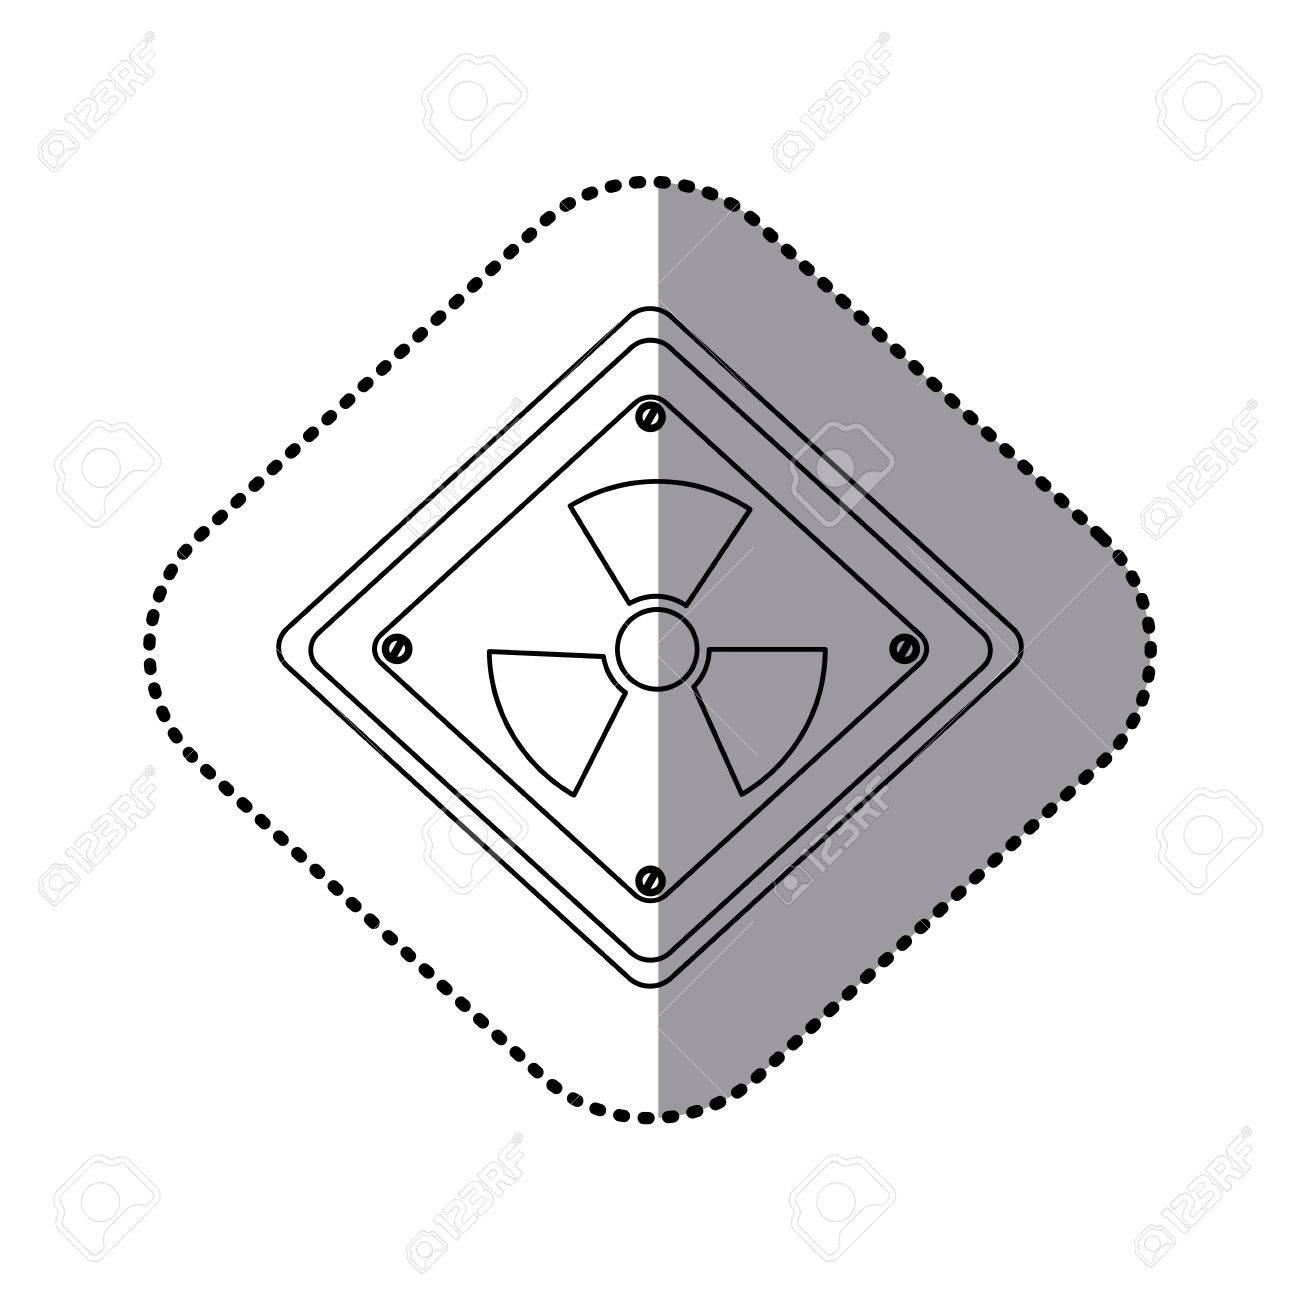 Monochrome silhouette sticker with square plate with radioactive monochrome silhouette sticker with square plate with radioactive symbol vector illustration stock vector 73444188 buycottarizona